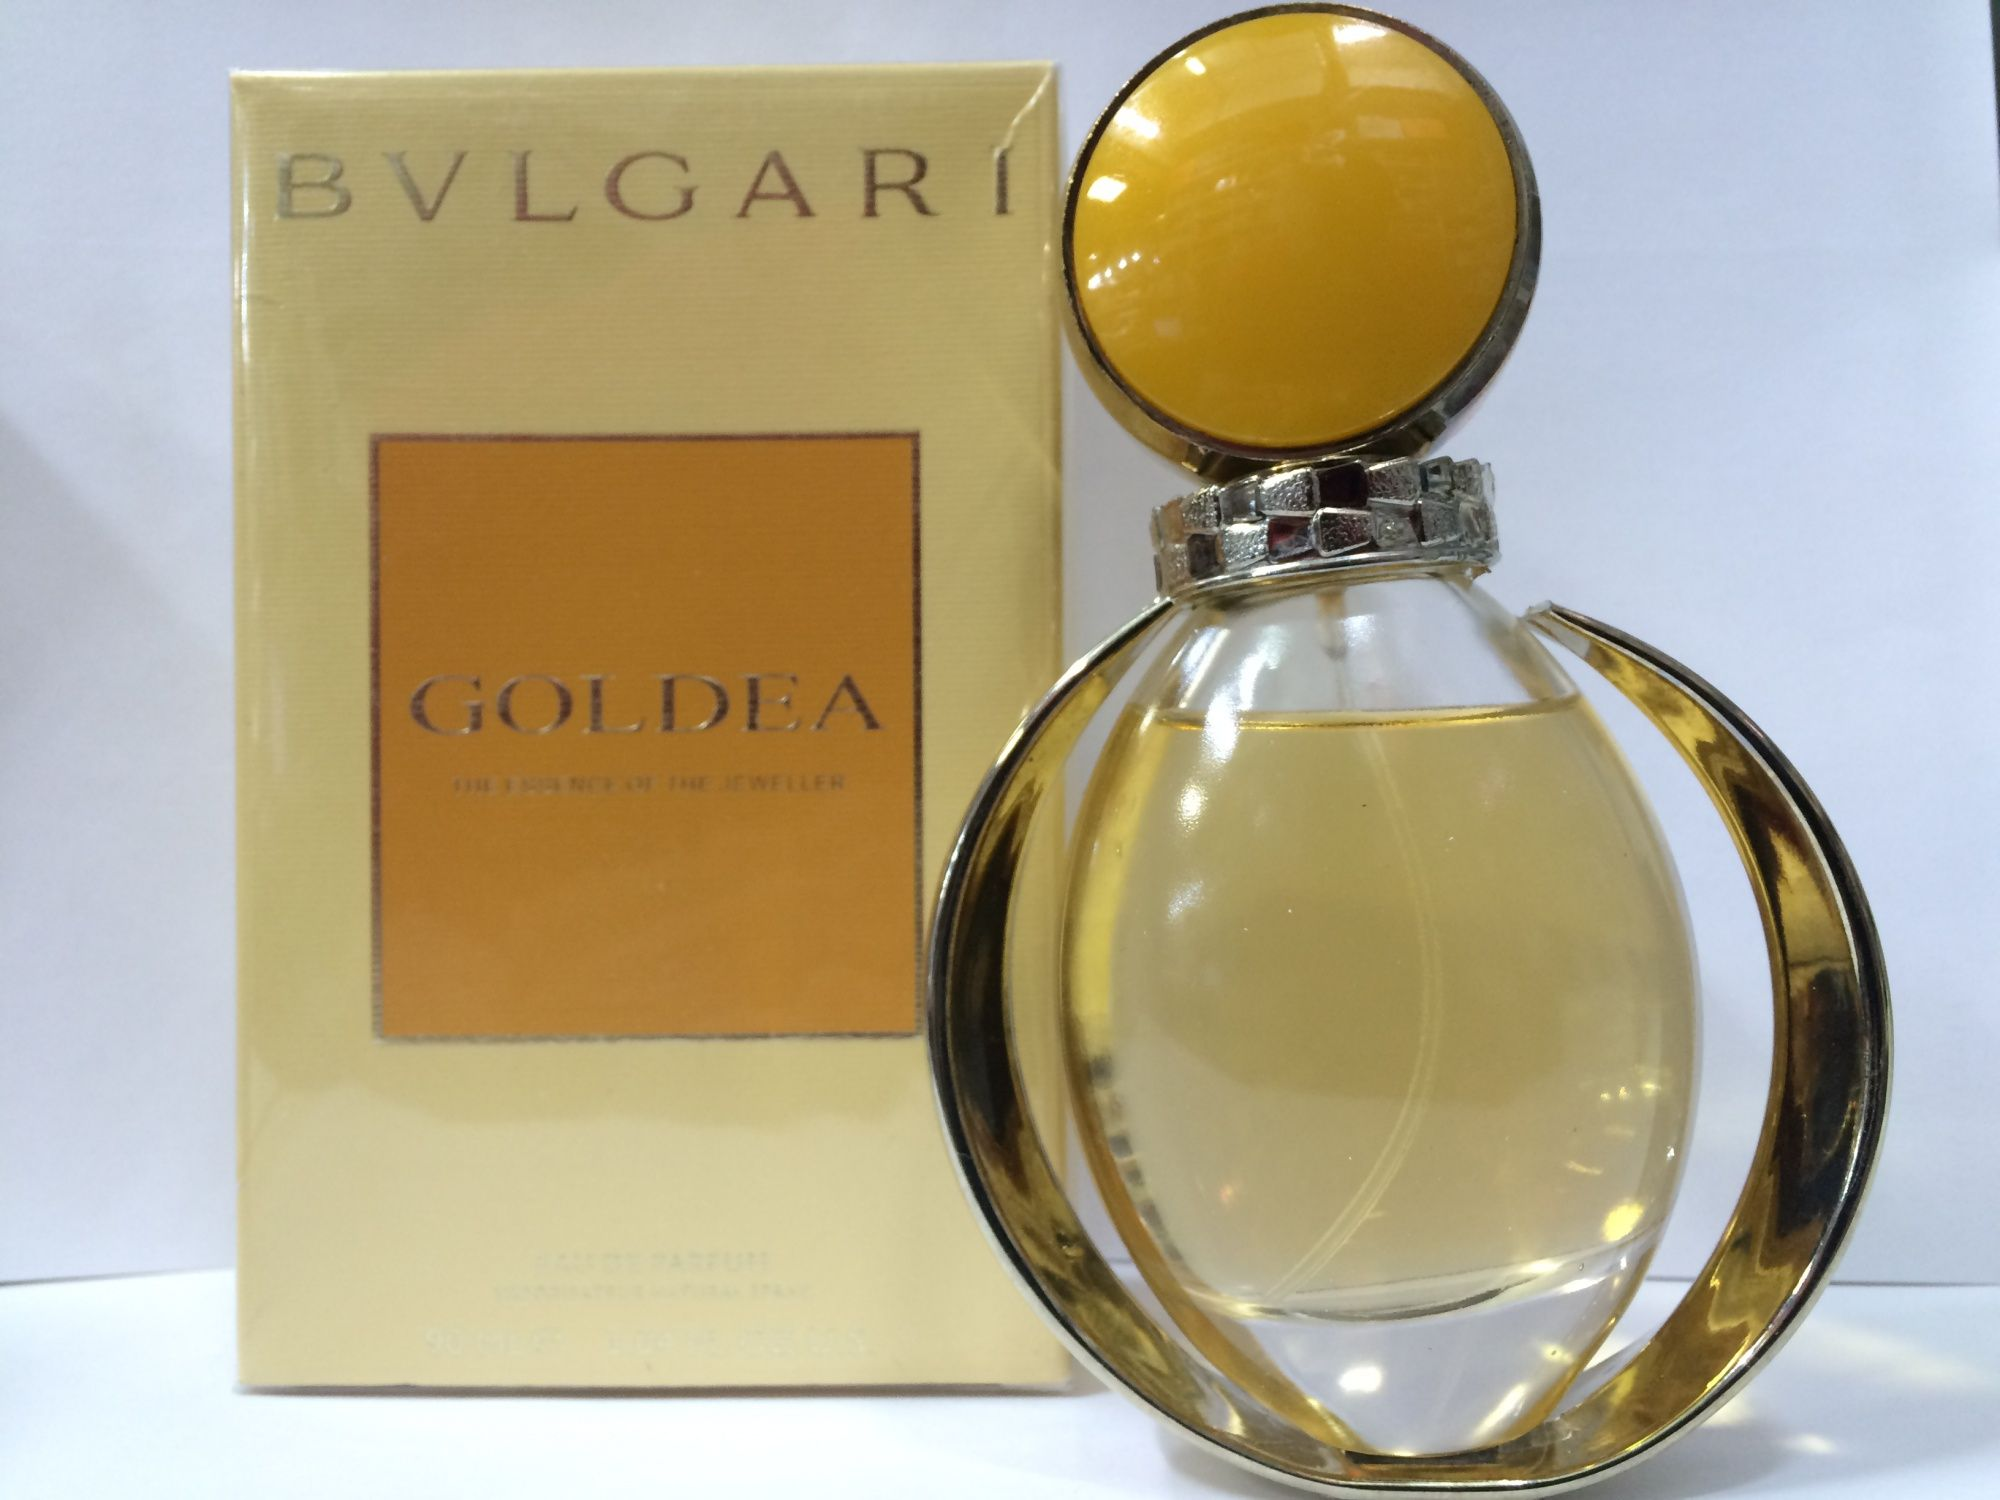 عطر جولديا الذهبي من بولغاري Perfume Bottles Bottle Perfume